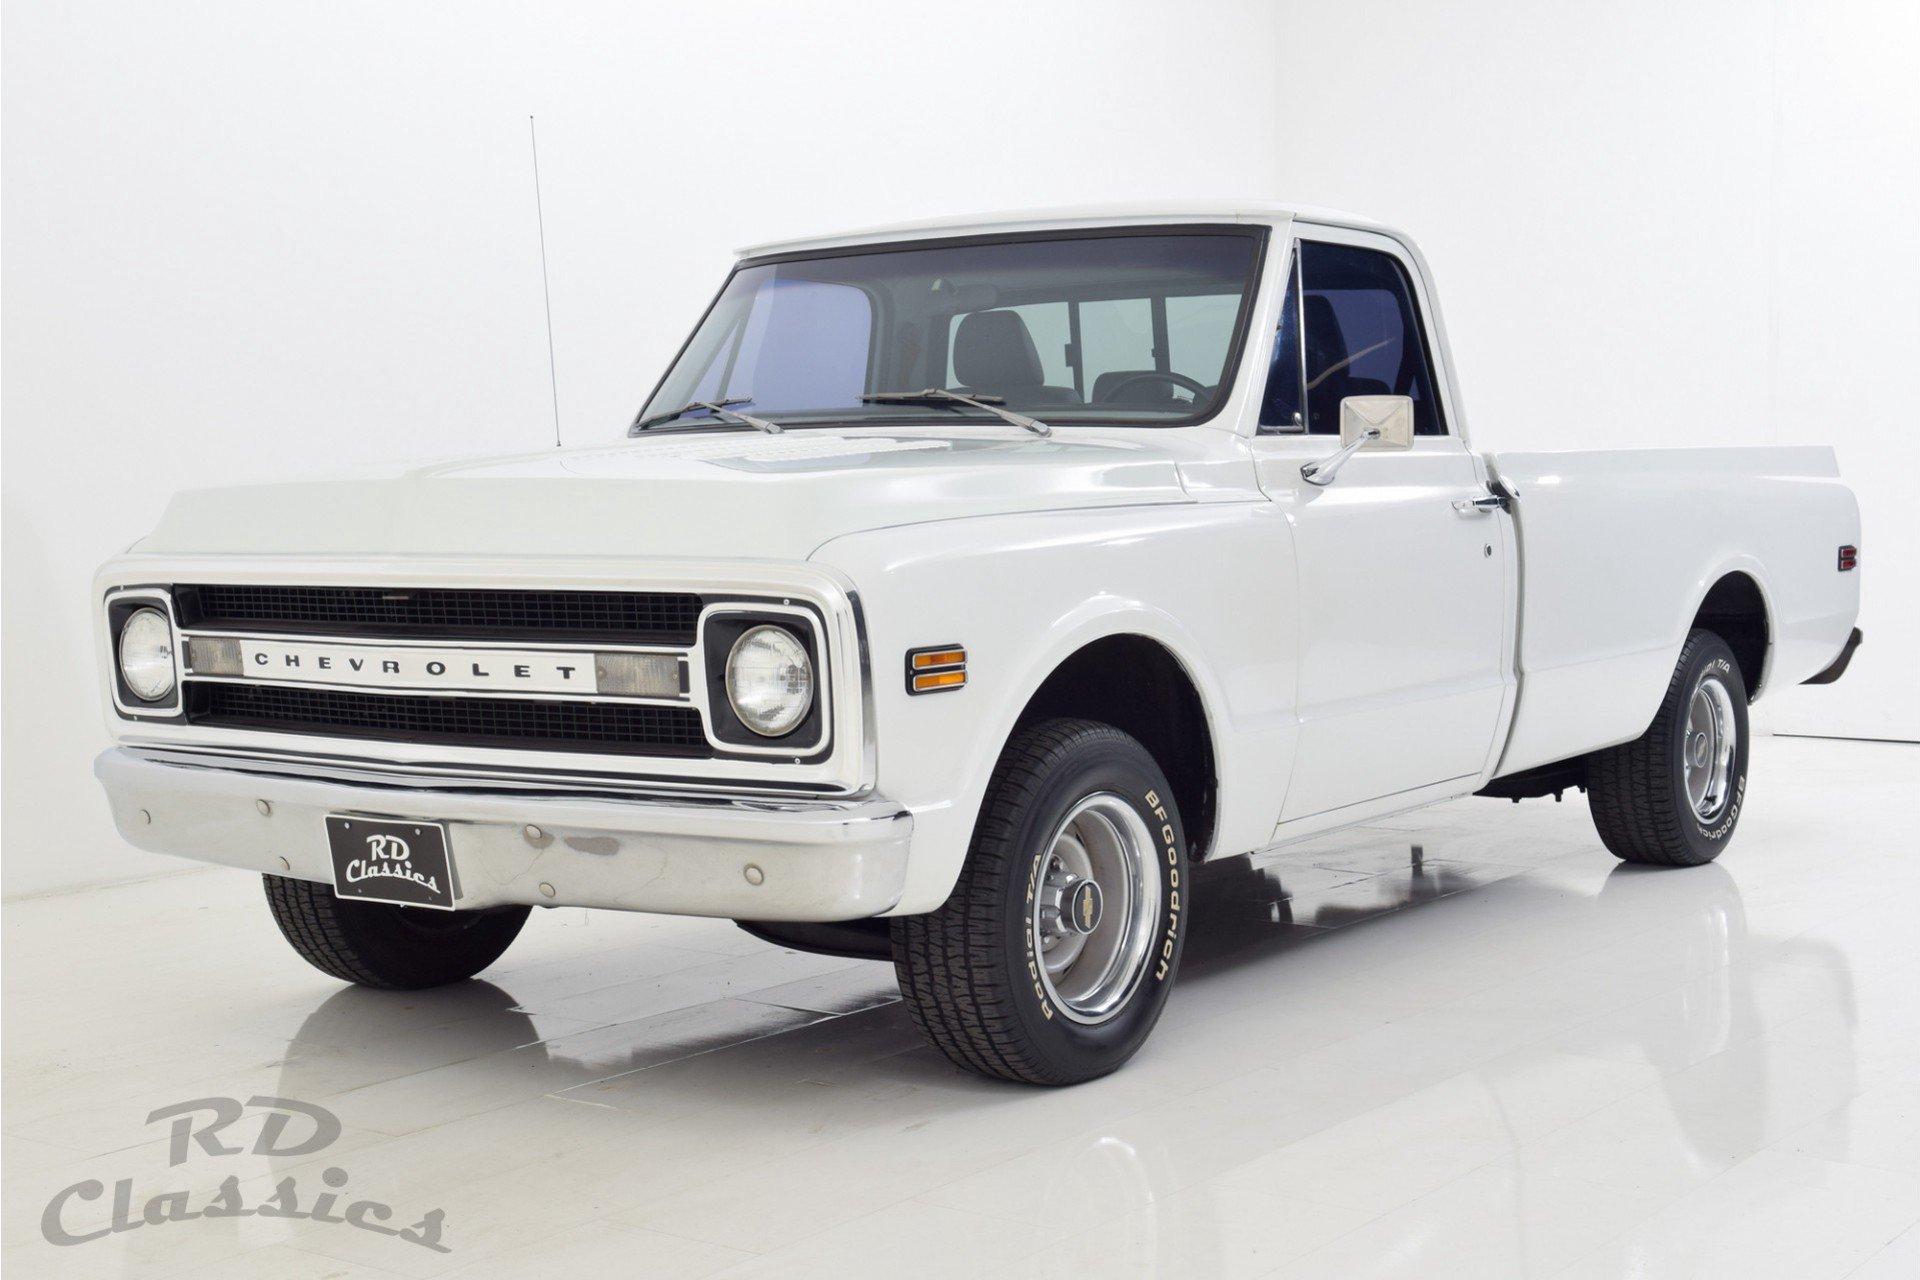 Chevrolet C10 Rd Classics